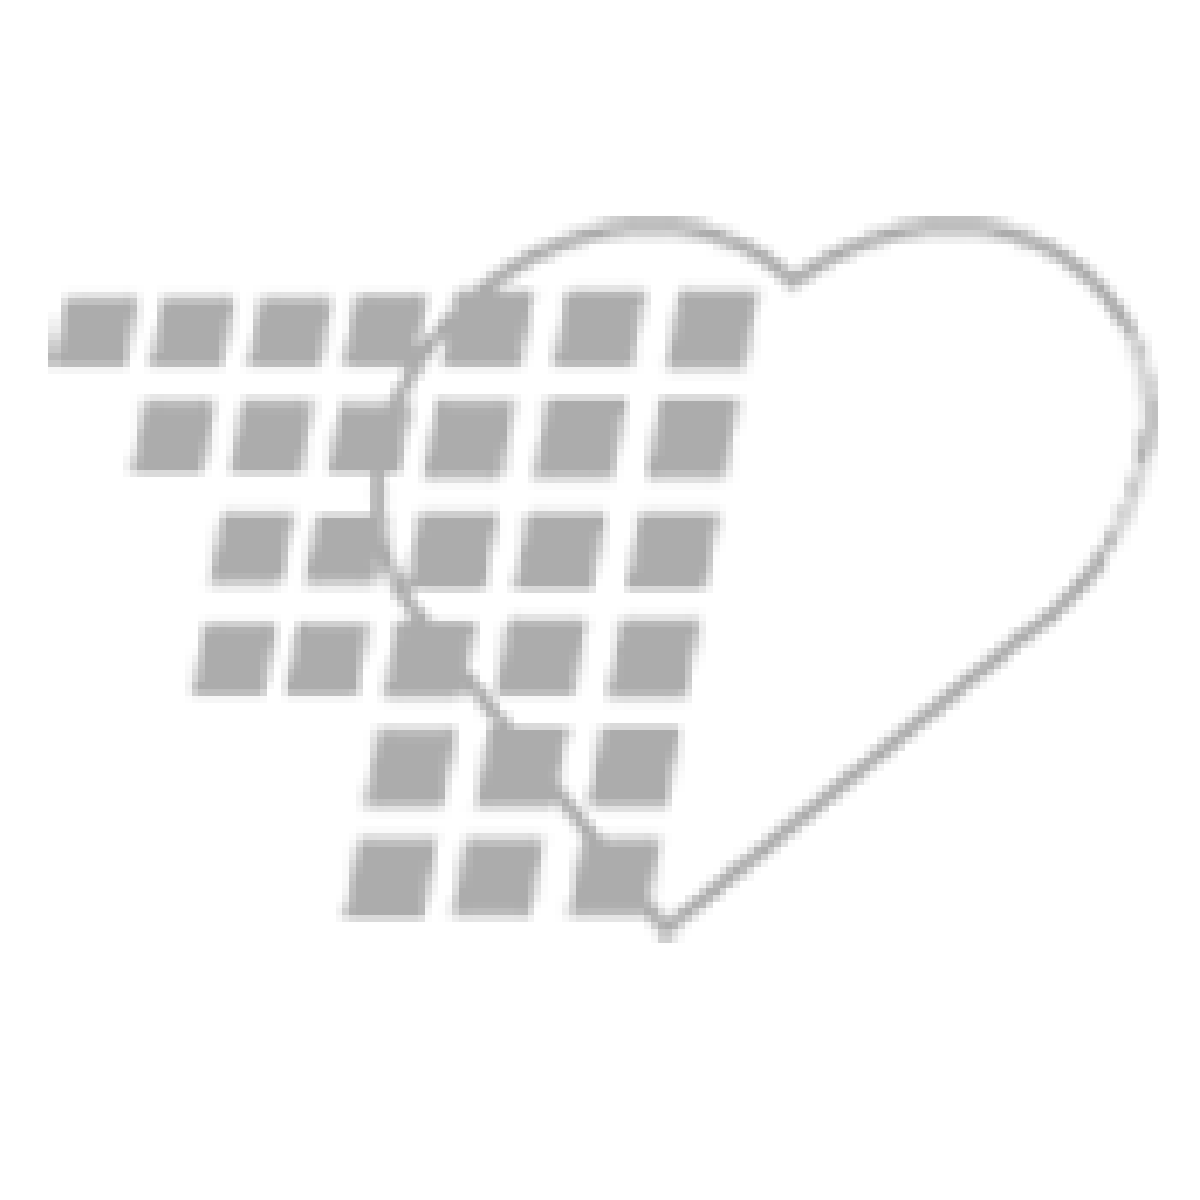 05-59-8300-2OZ - Bulb Syringe Sterile - 2oz